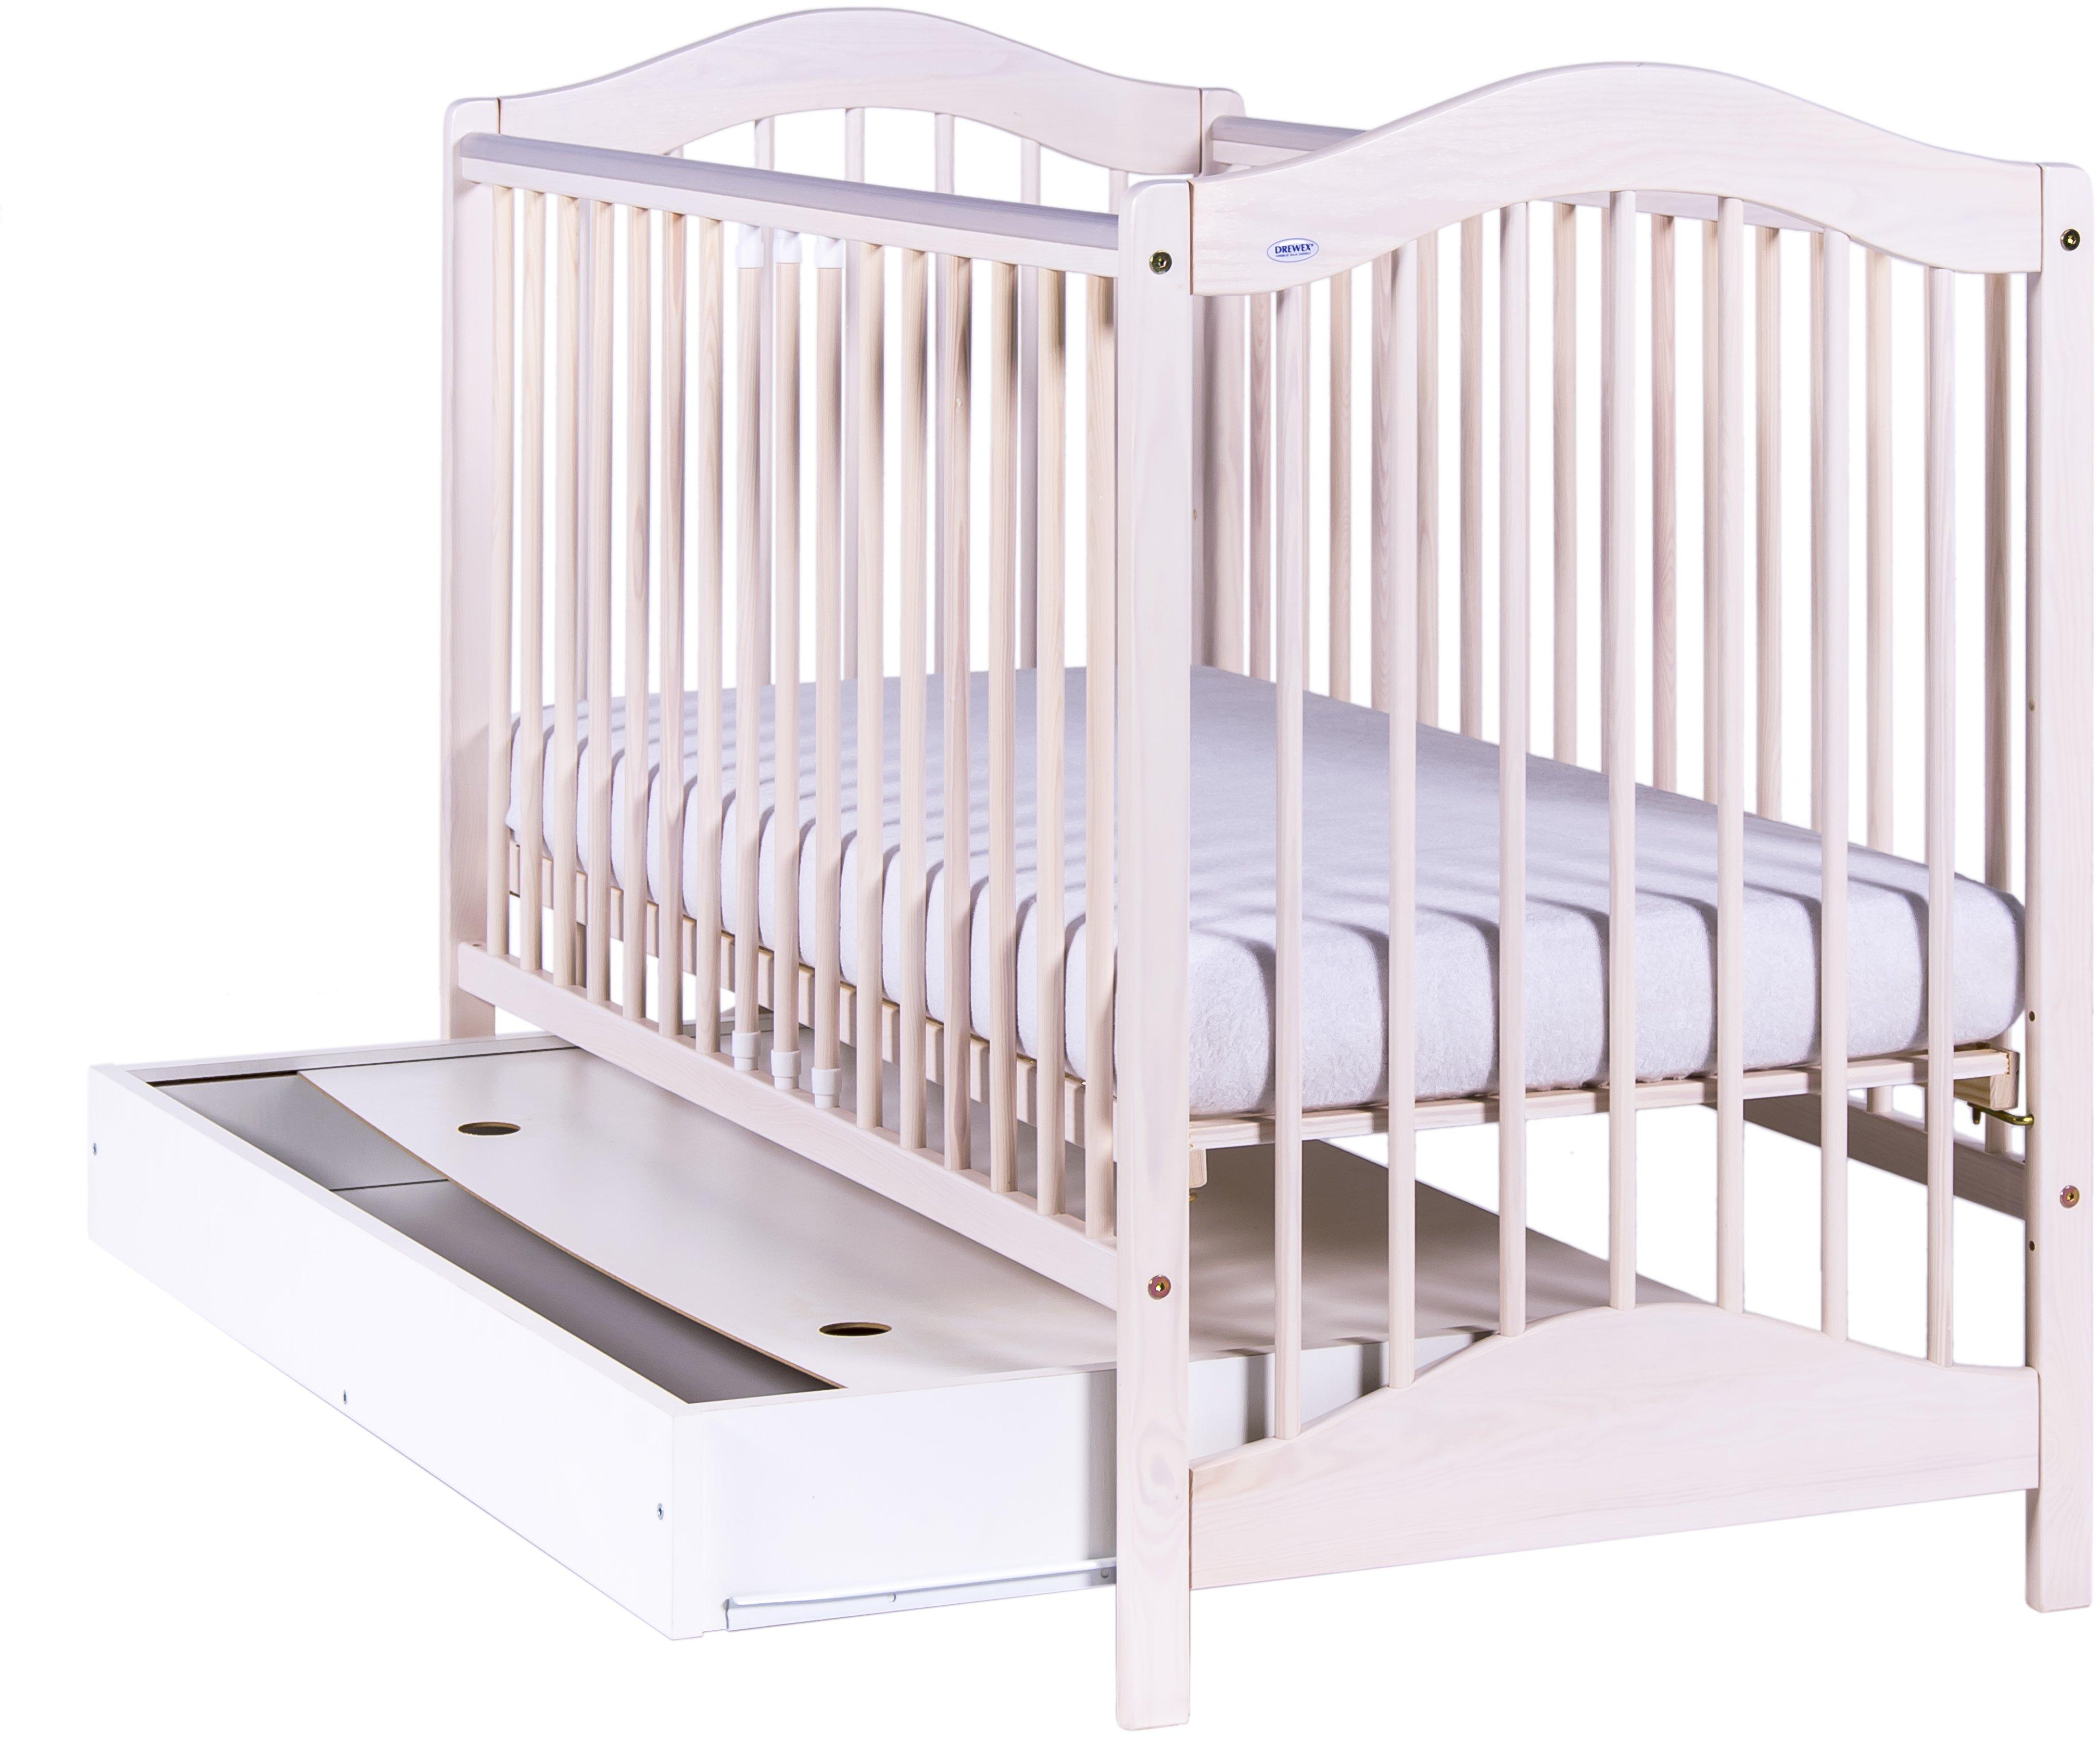 Bērnu gulta ar kasti Drewex JAGODA balināta priede